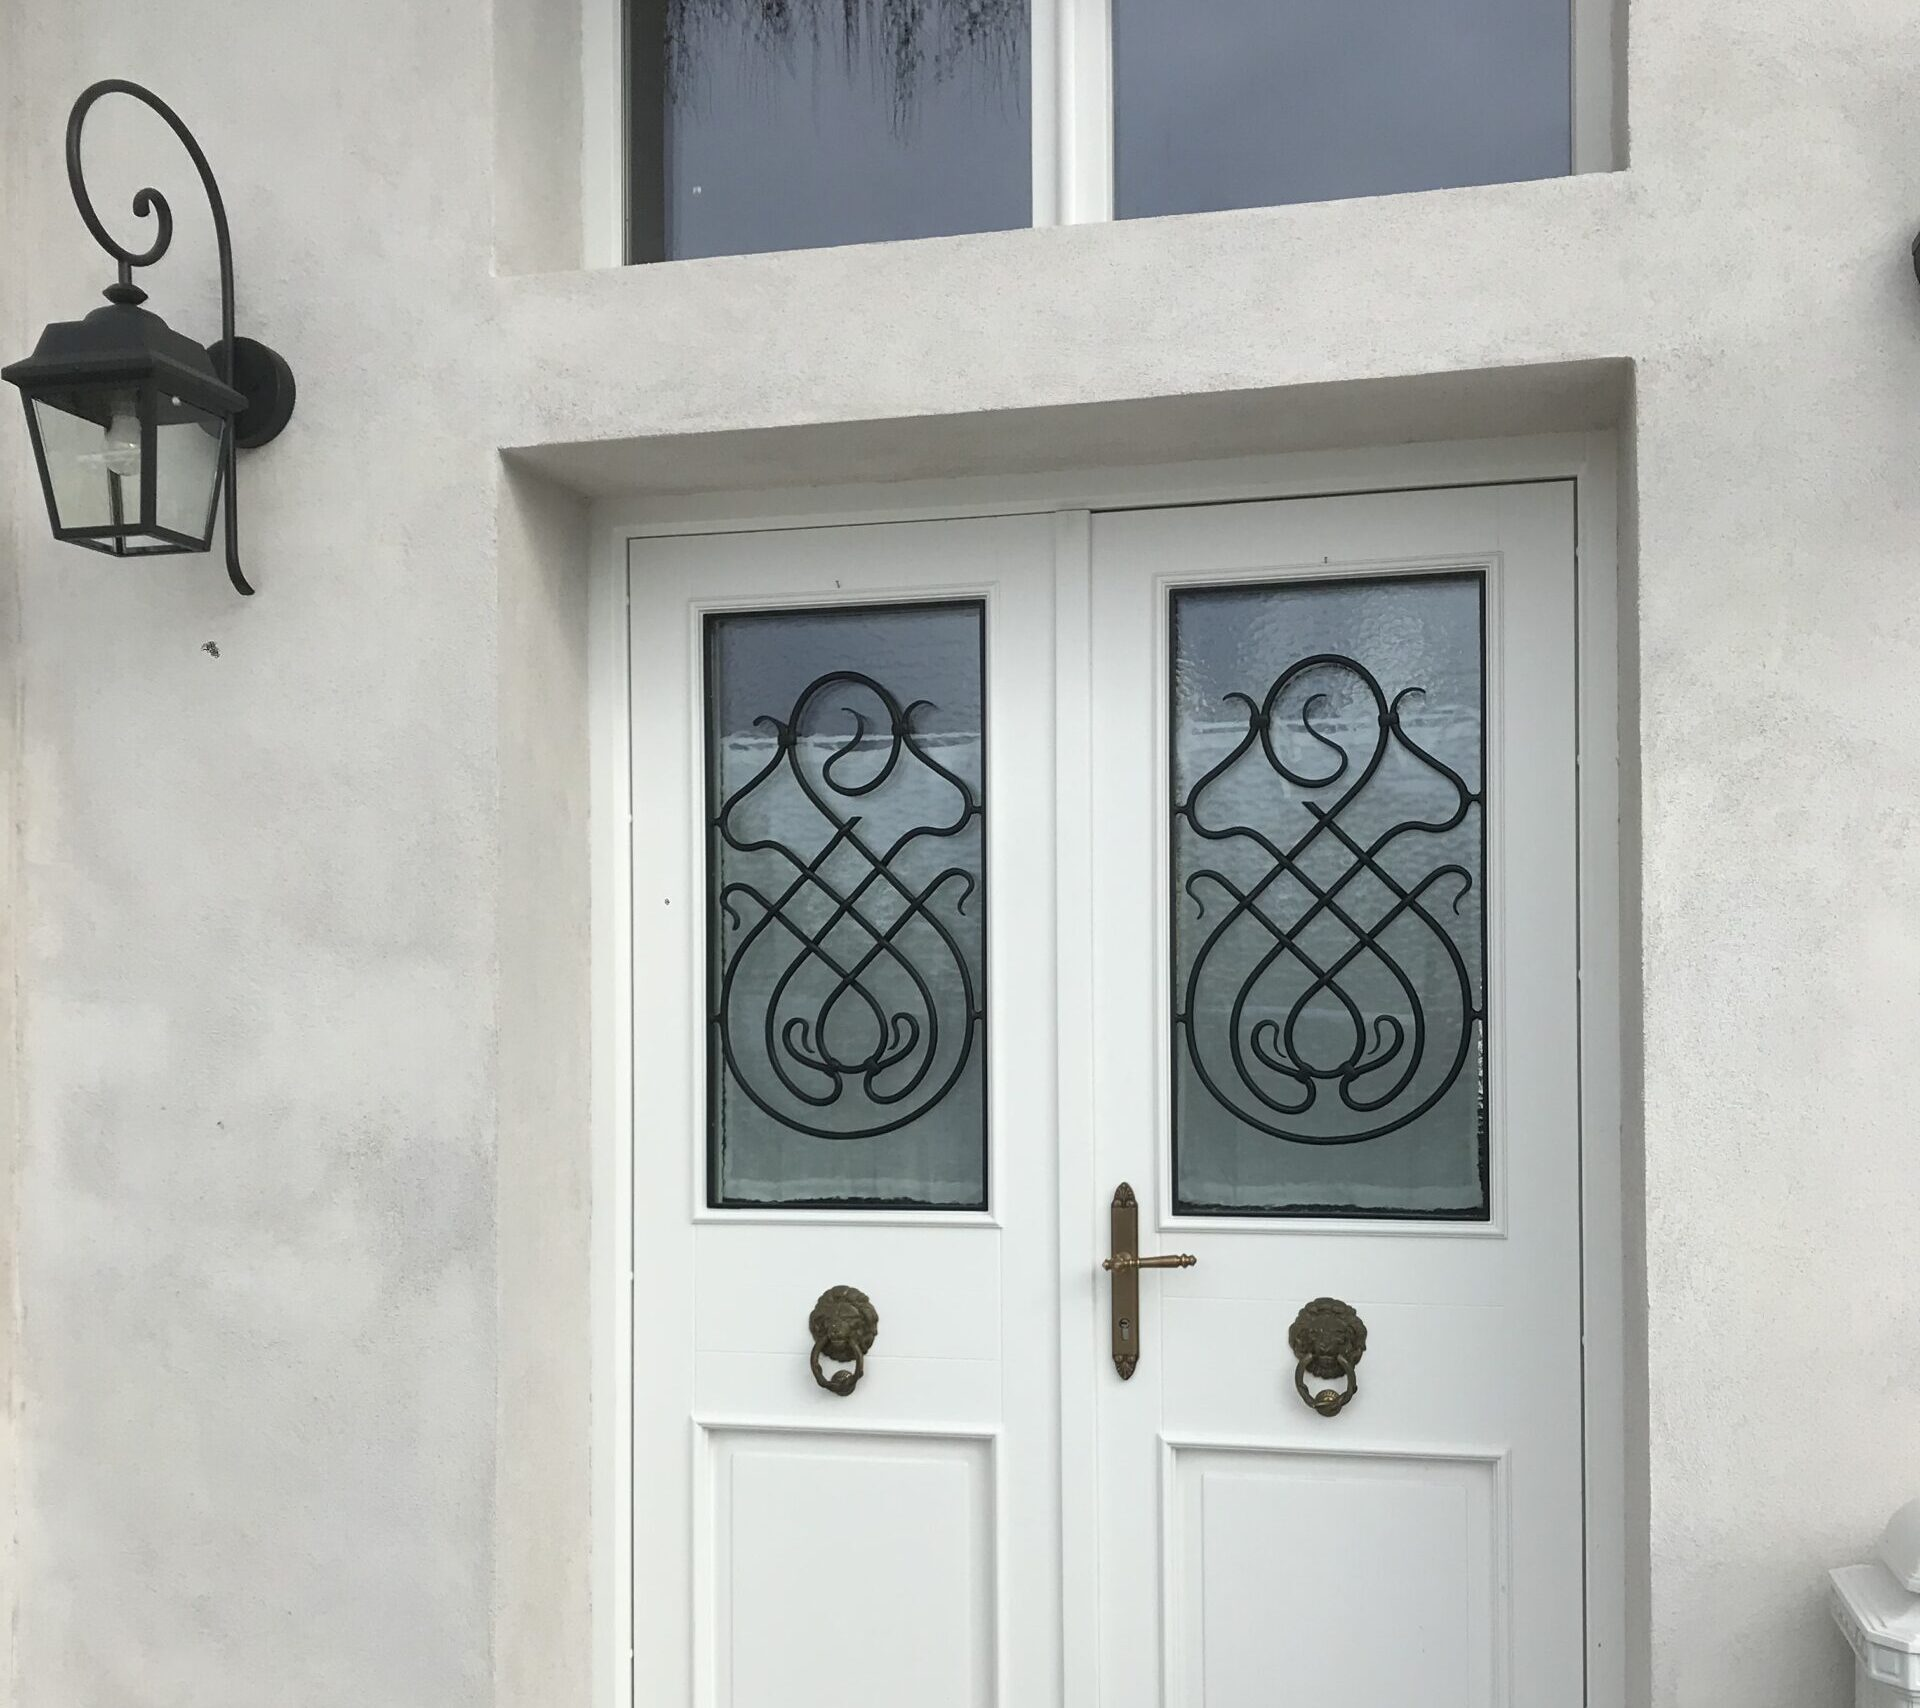 Schlosserei Strodl Gitter bei Eingangstüre